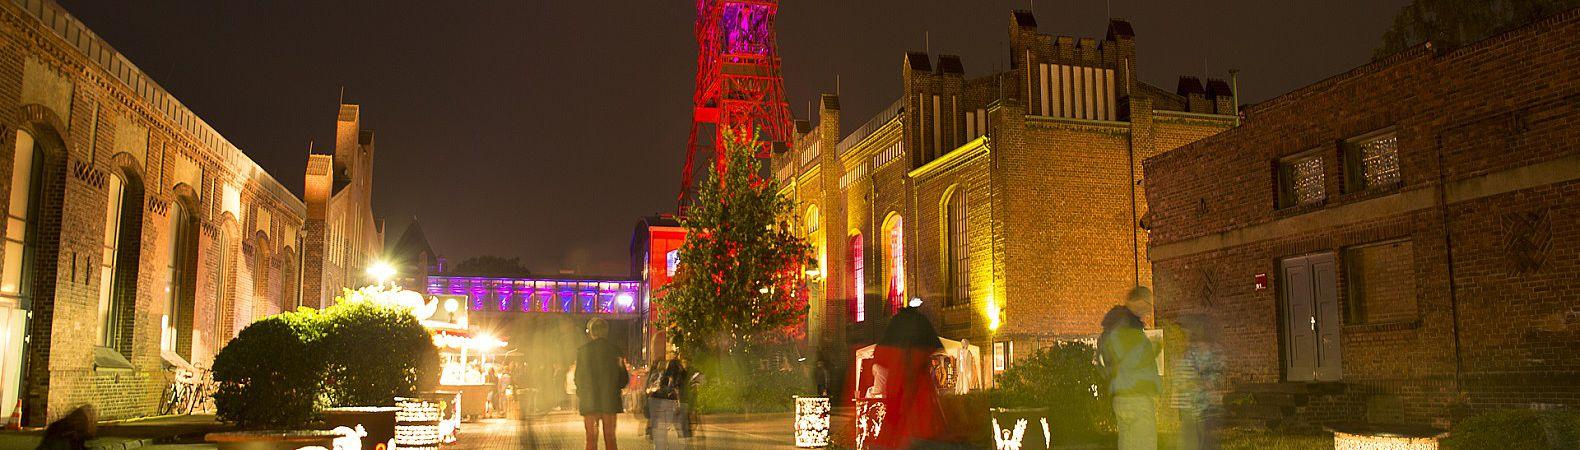 Ruhr Tourismus/ Nolde